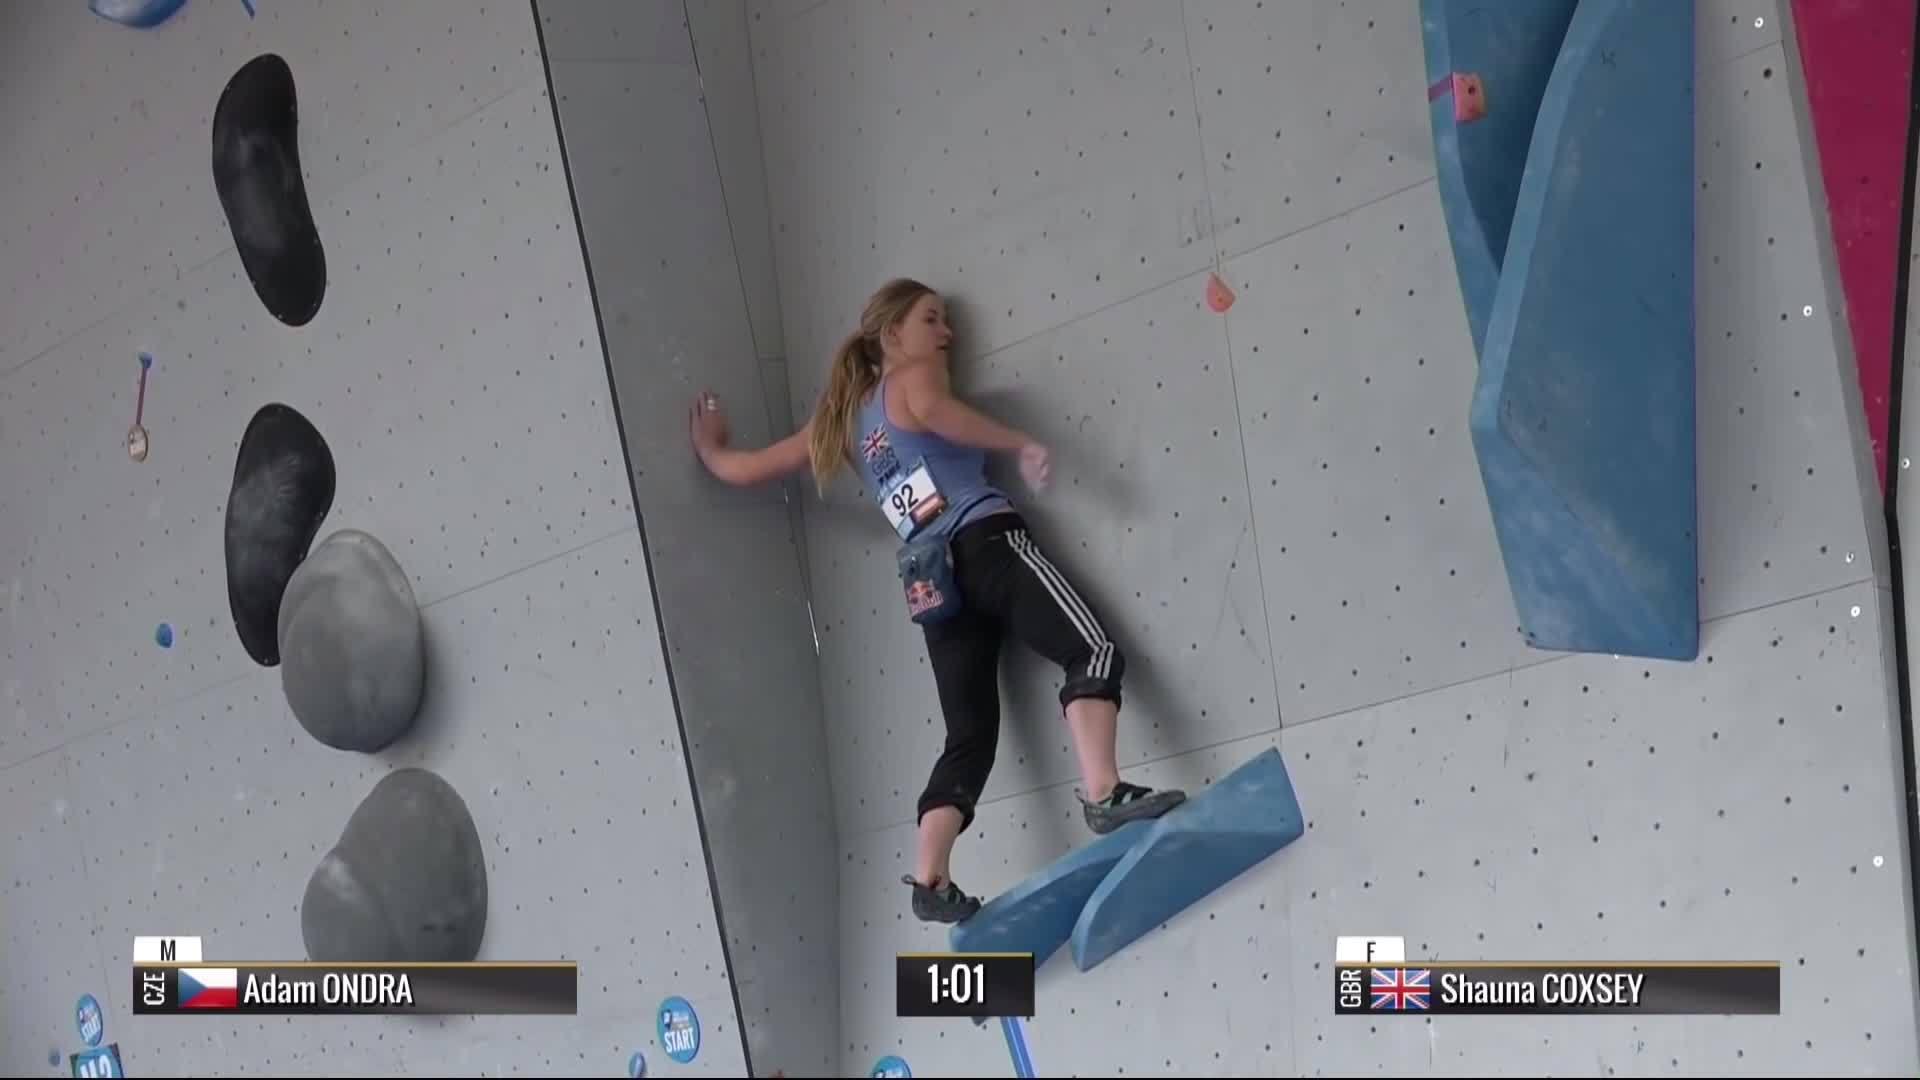 hard boulder moves 2015, international federation of sport climbing (organization), psyched bouldering, Shauna Coxsey Bouldering 2015 GIFs